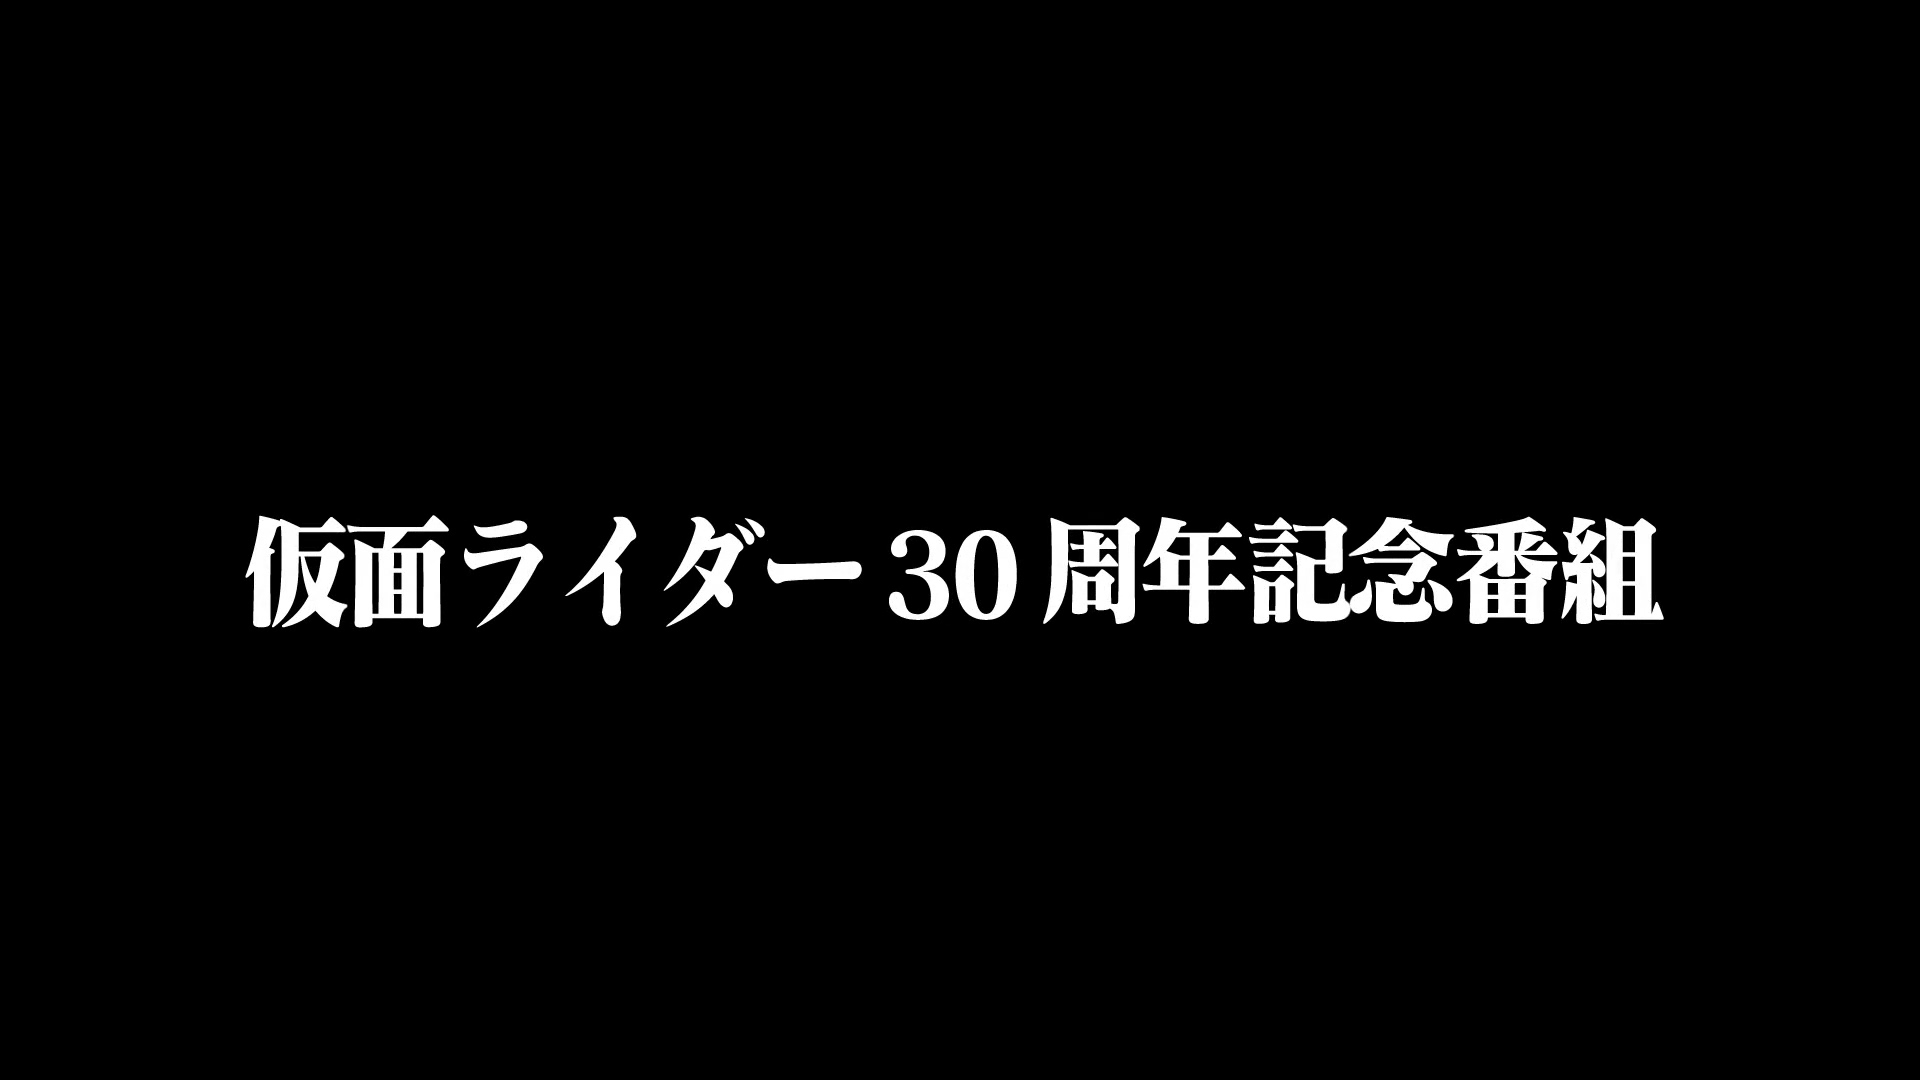 Kamen Rider 30th Anniversary